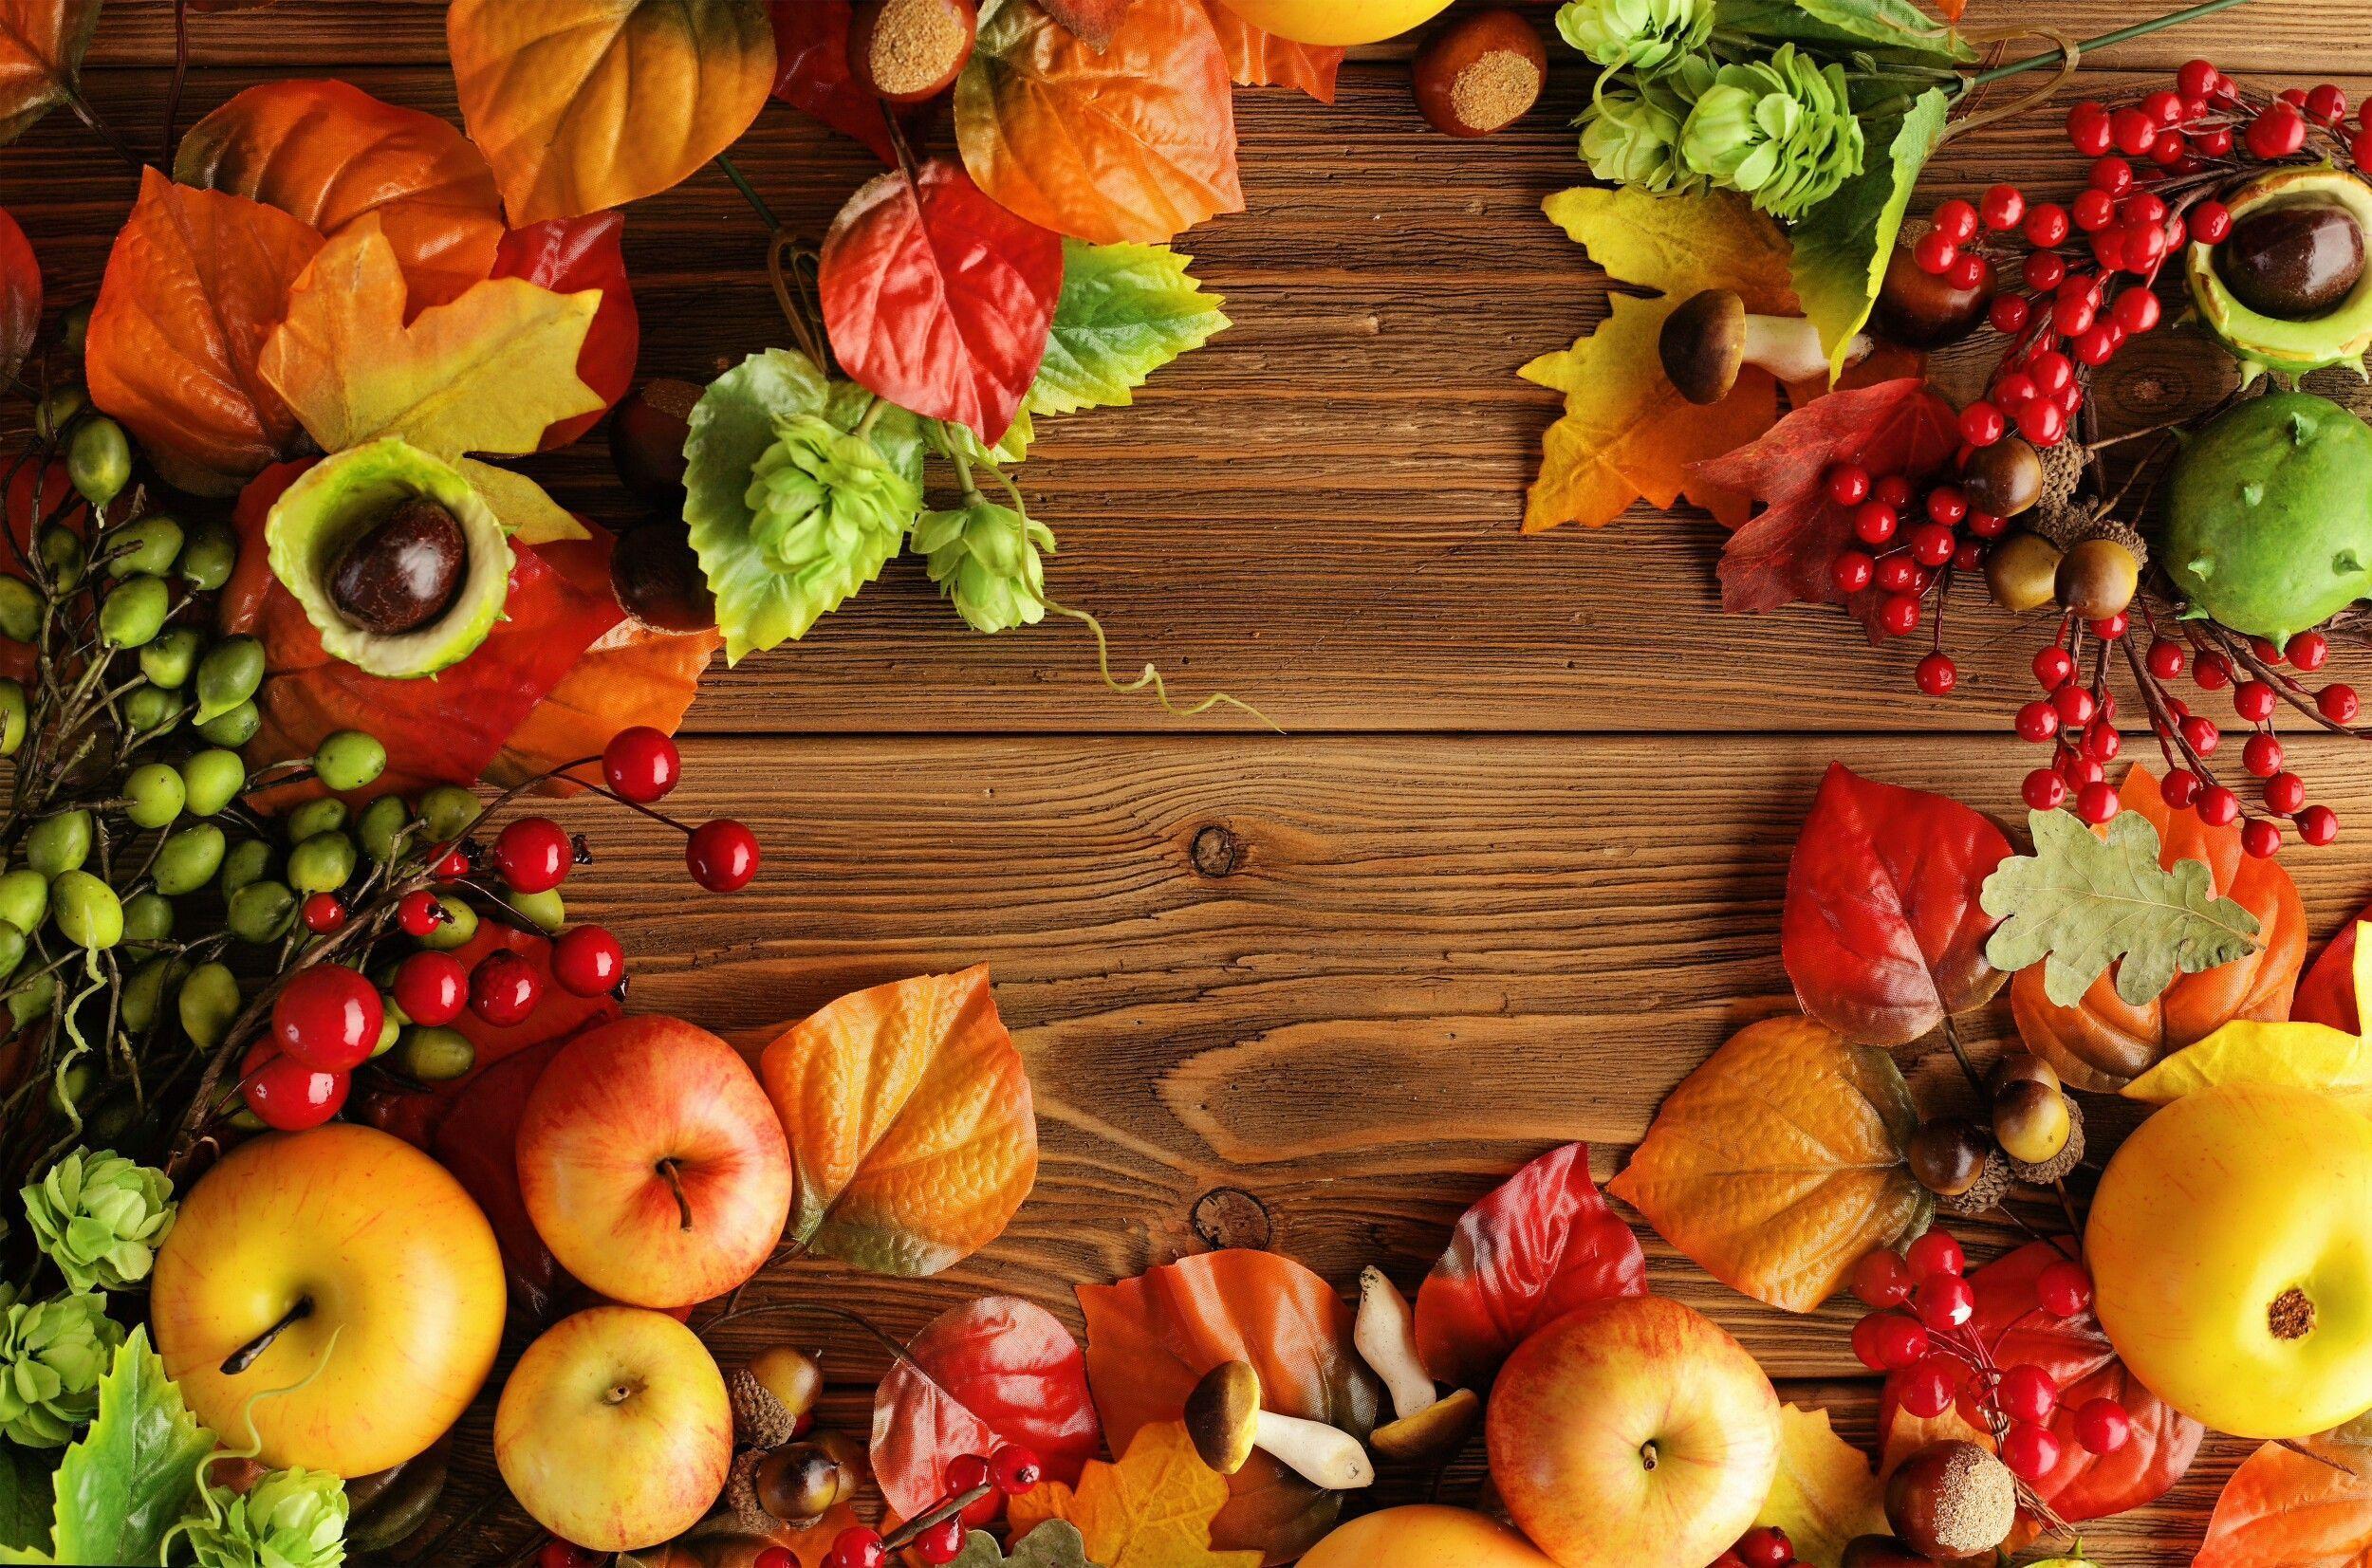 Autumn Fruit Wallpapers Top Free Autumn Fruit Backgrounds Wallpaperaccess